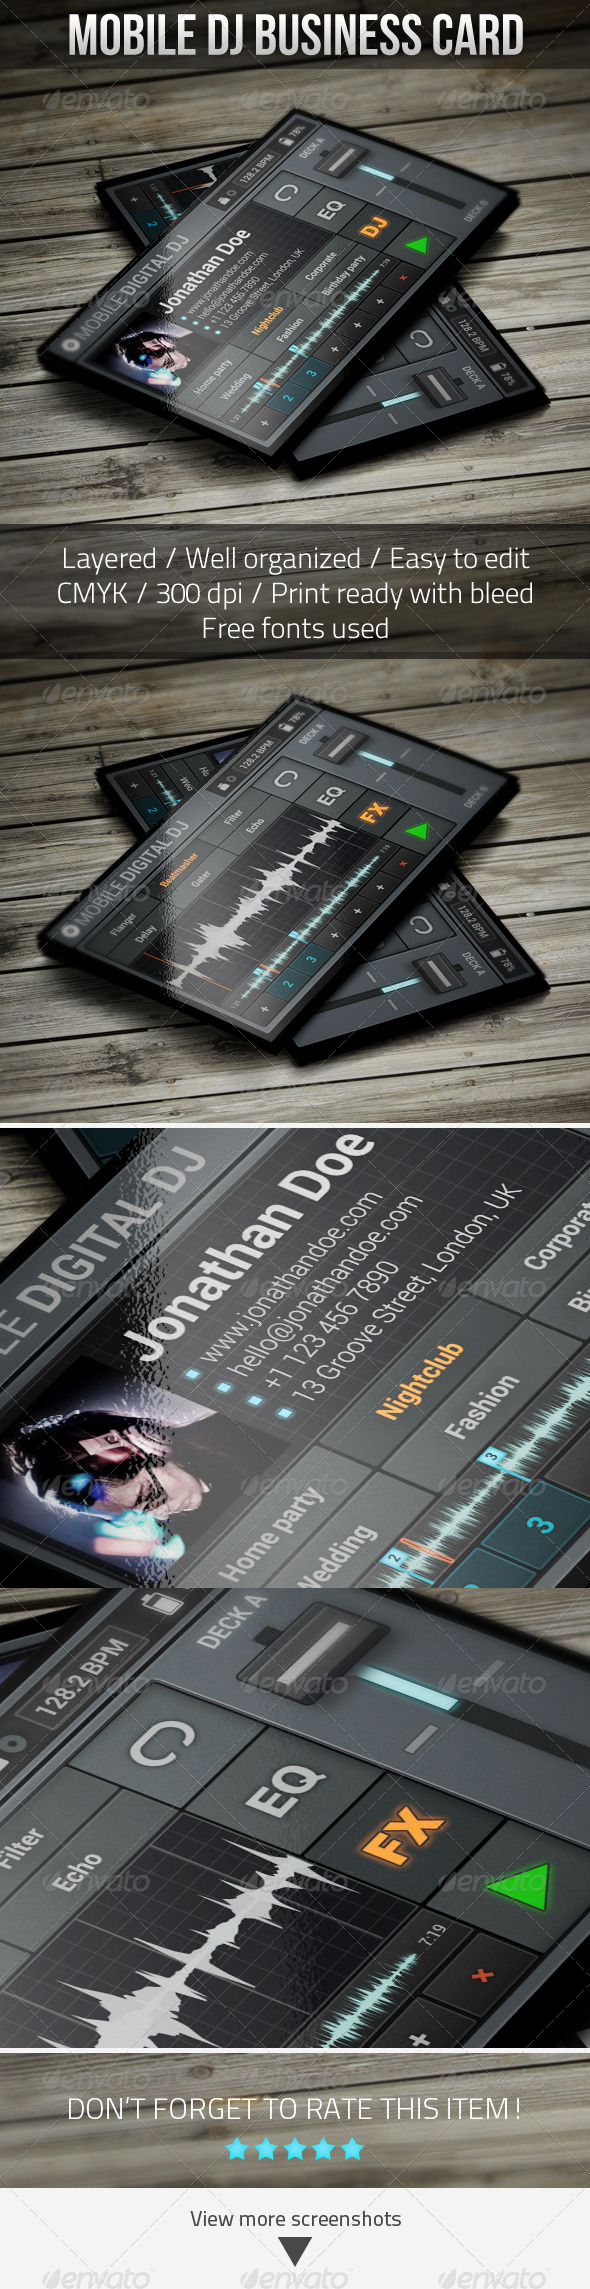 GraphicRiver Mobile Digital DJ Business Card 5286301